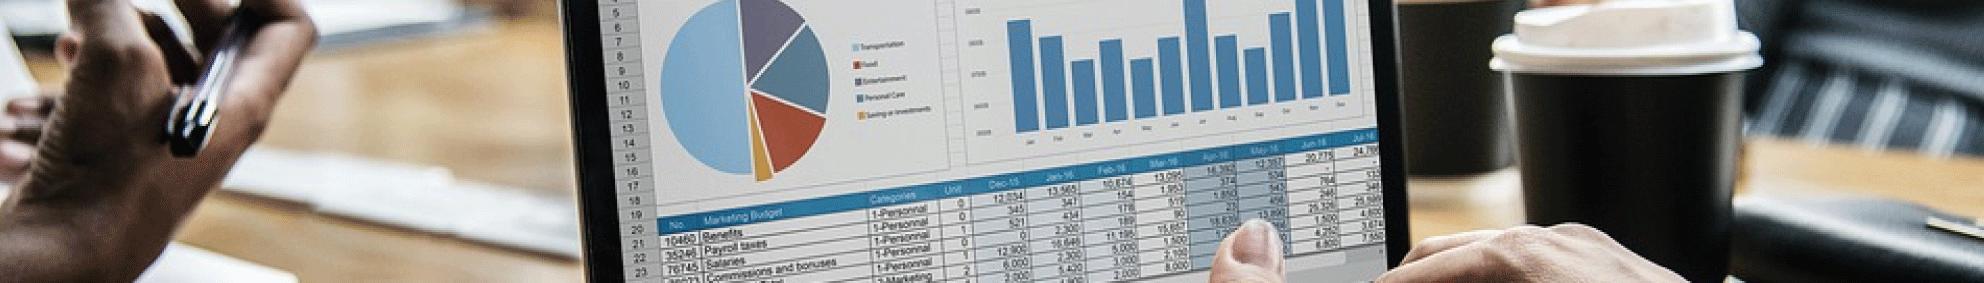 statistics_marketing_automation